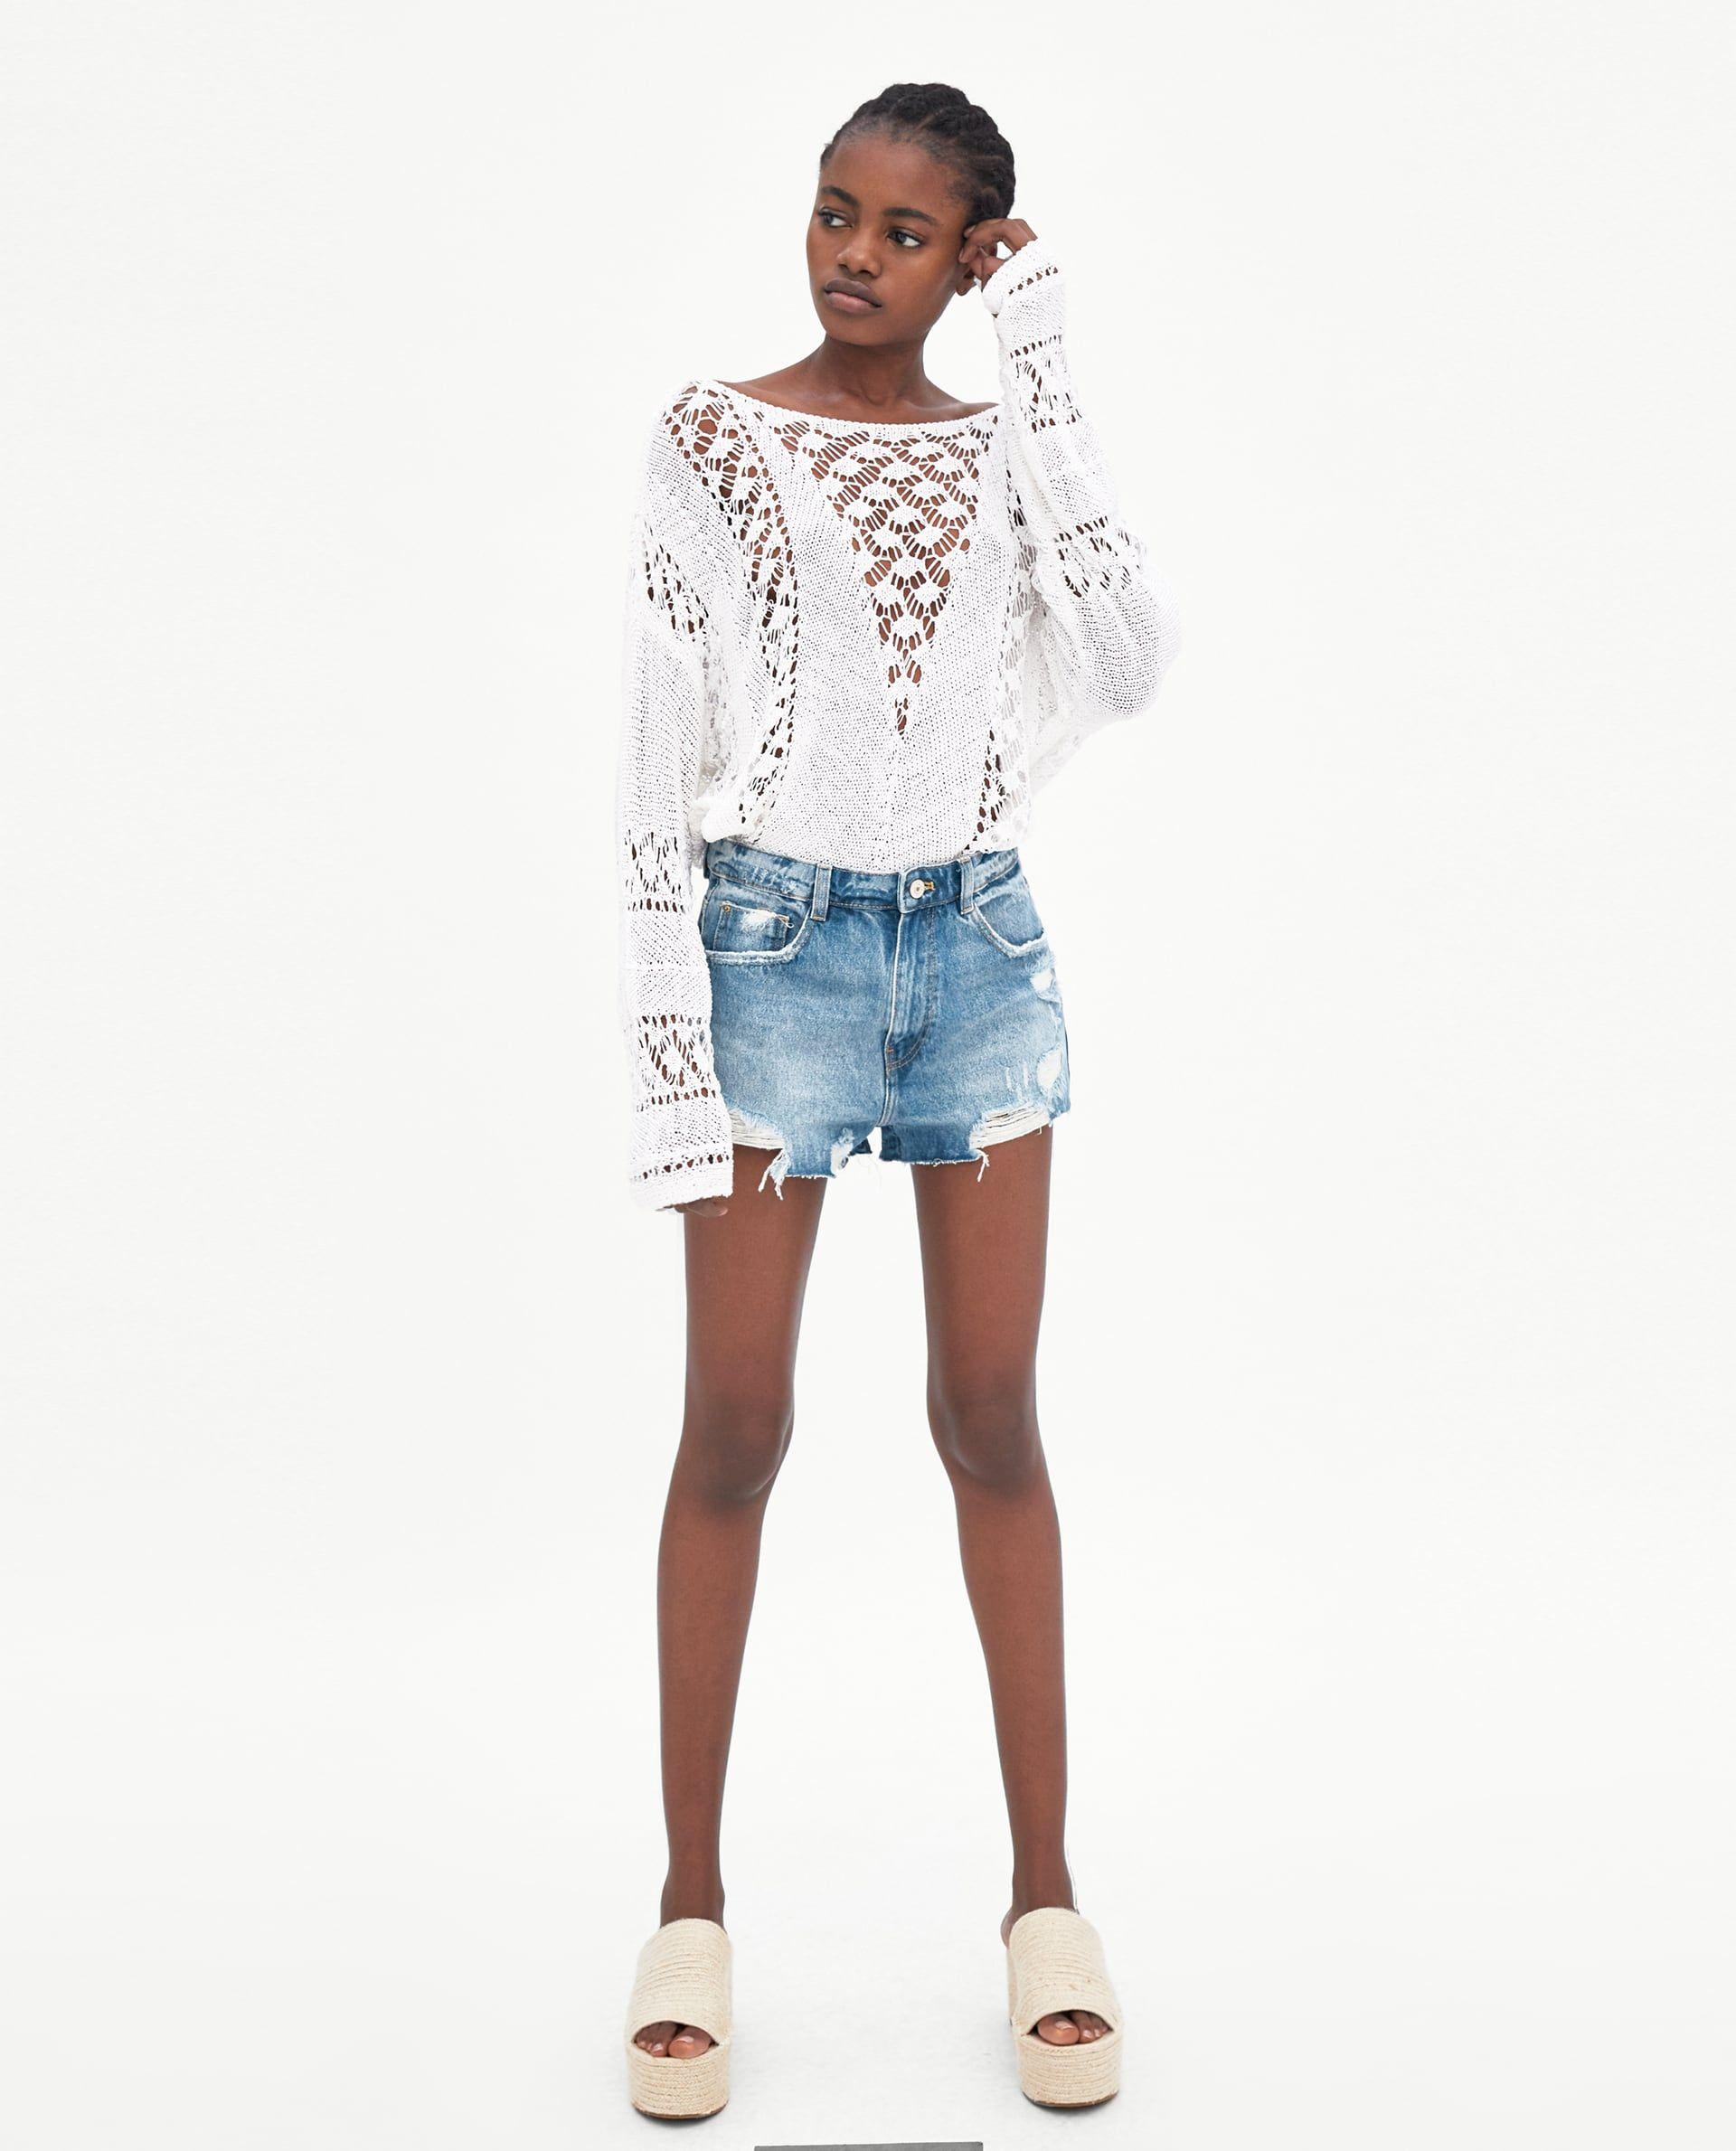 823e330b51 SHORT DENIM TIRO ALTO ROTOS | Zara | Denim shorts, Ripped denim, Shorts